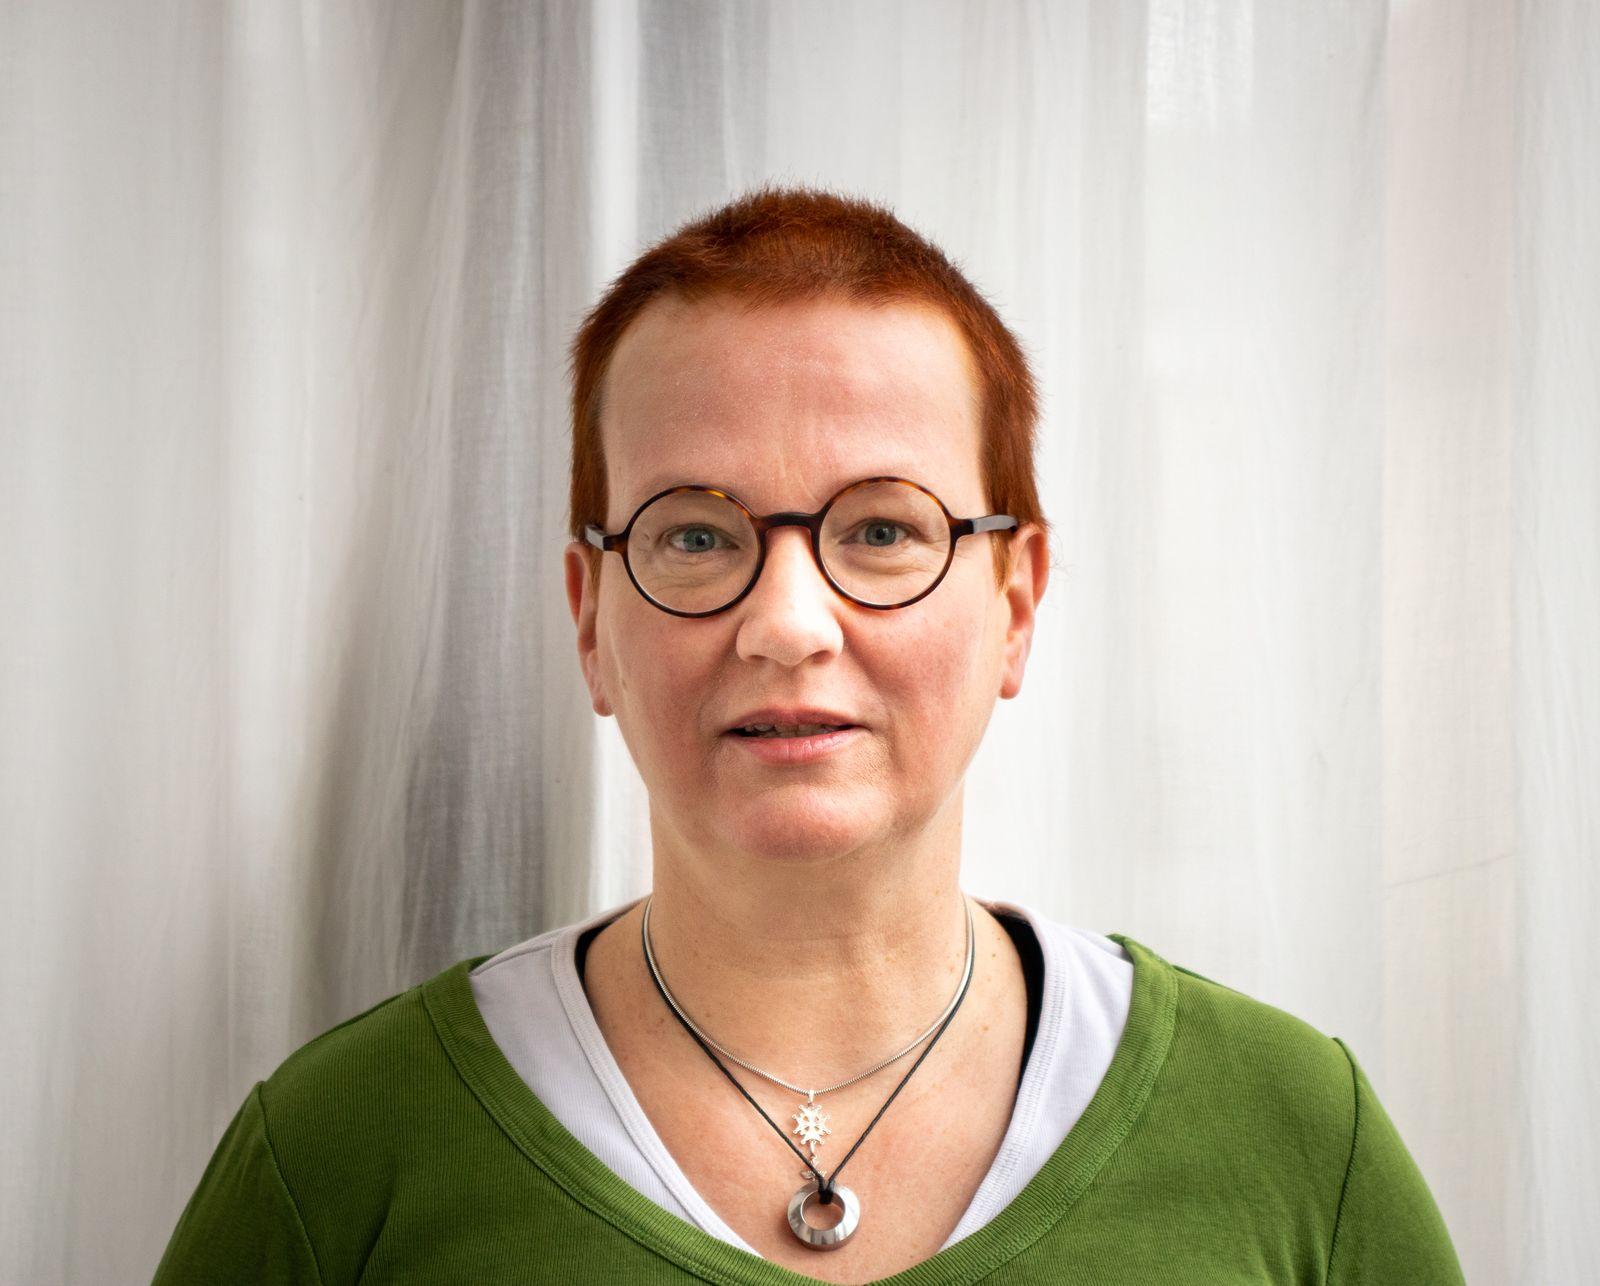 Dr. Anna Veronika Wendland